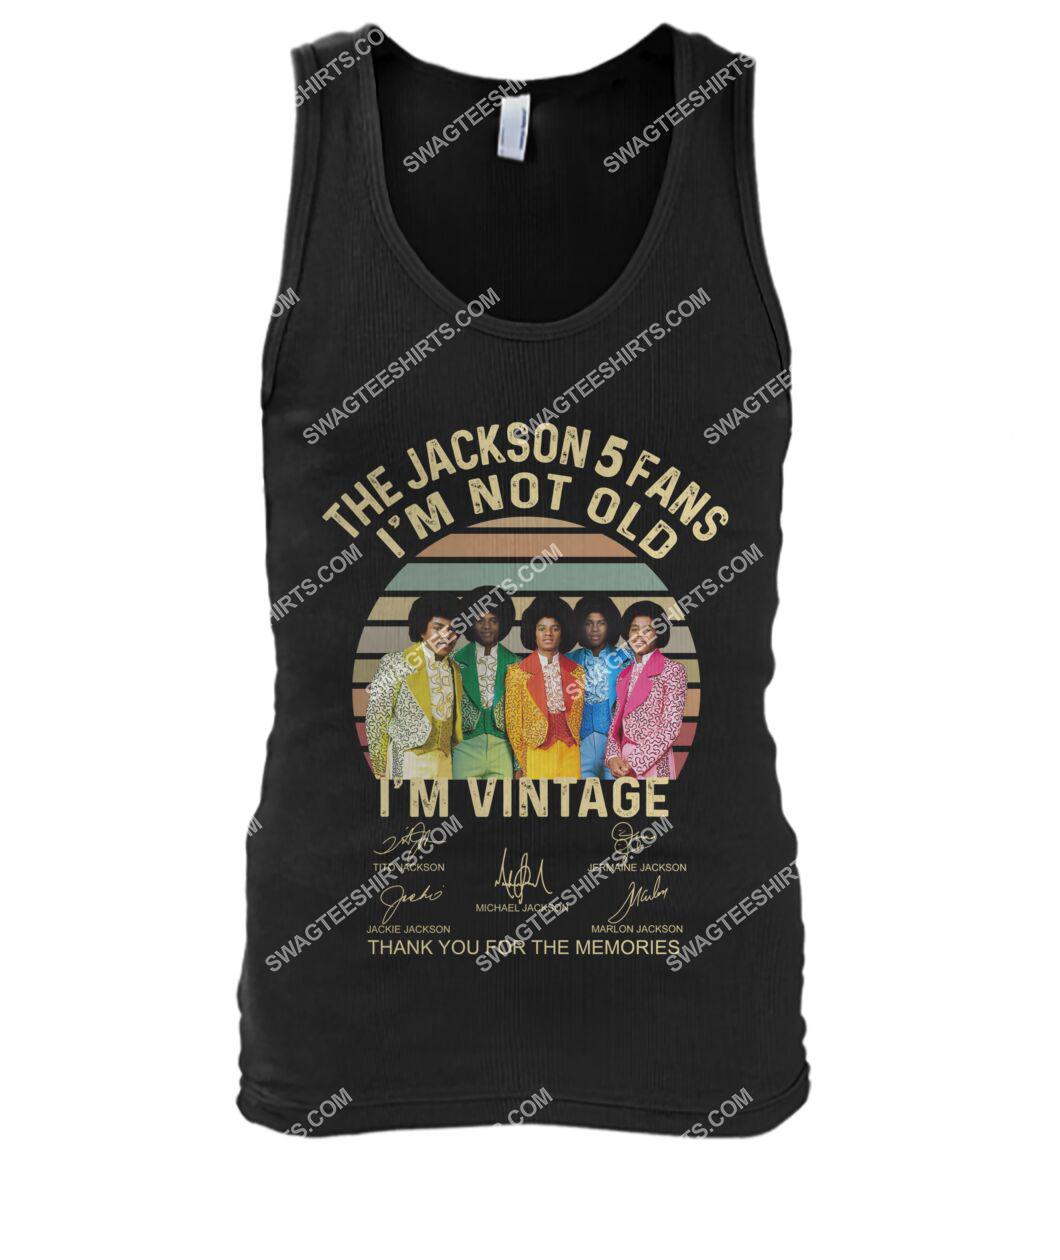 the jackson 5 fans i'm not old i'm vintage tank top 1